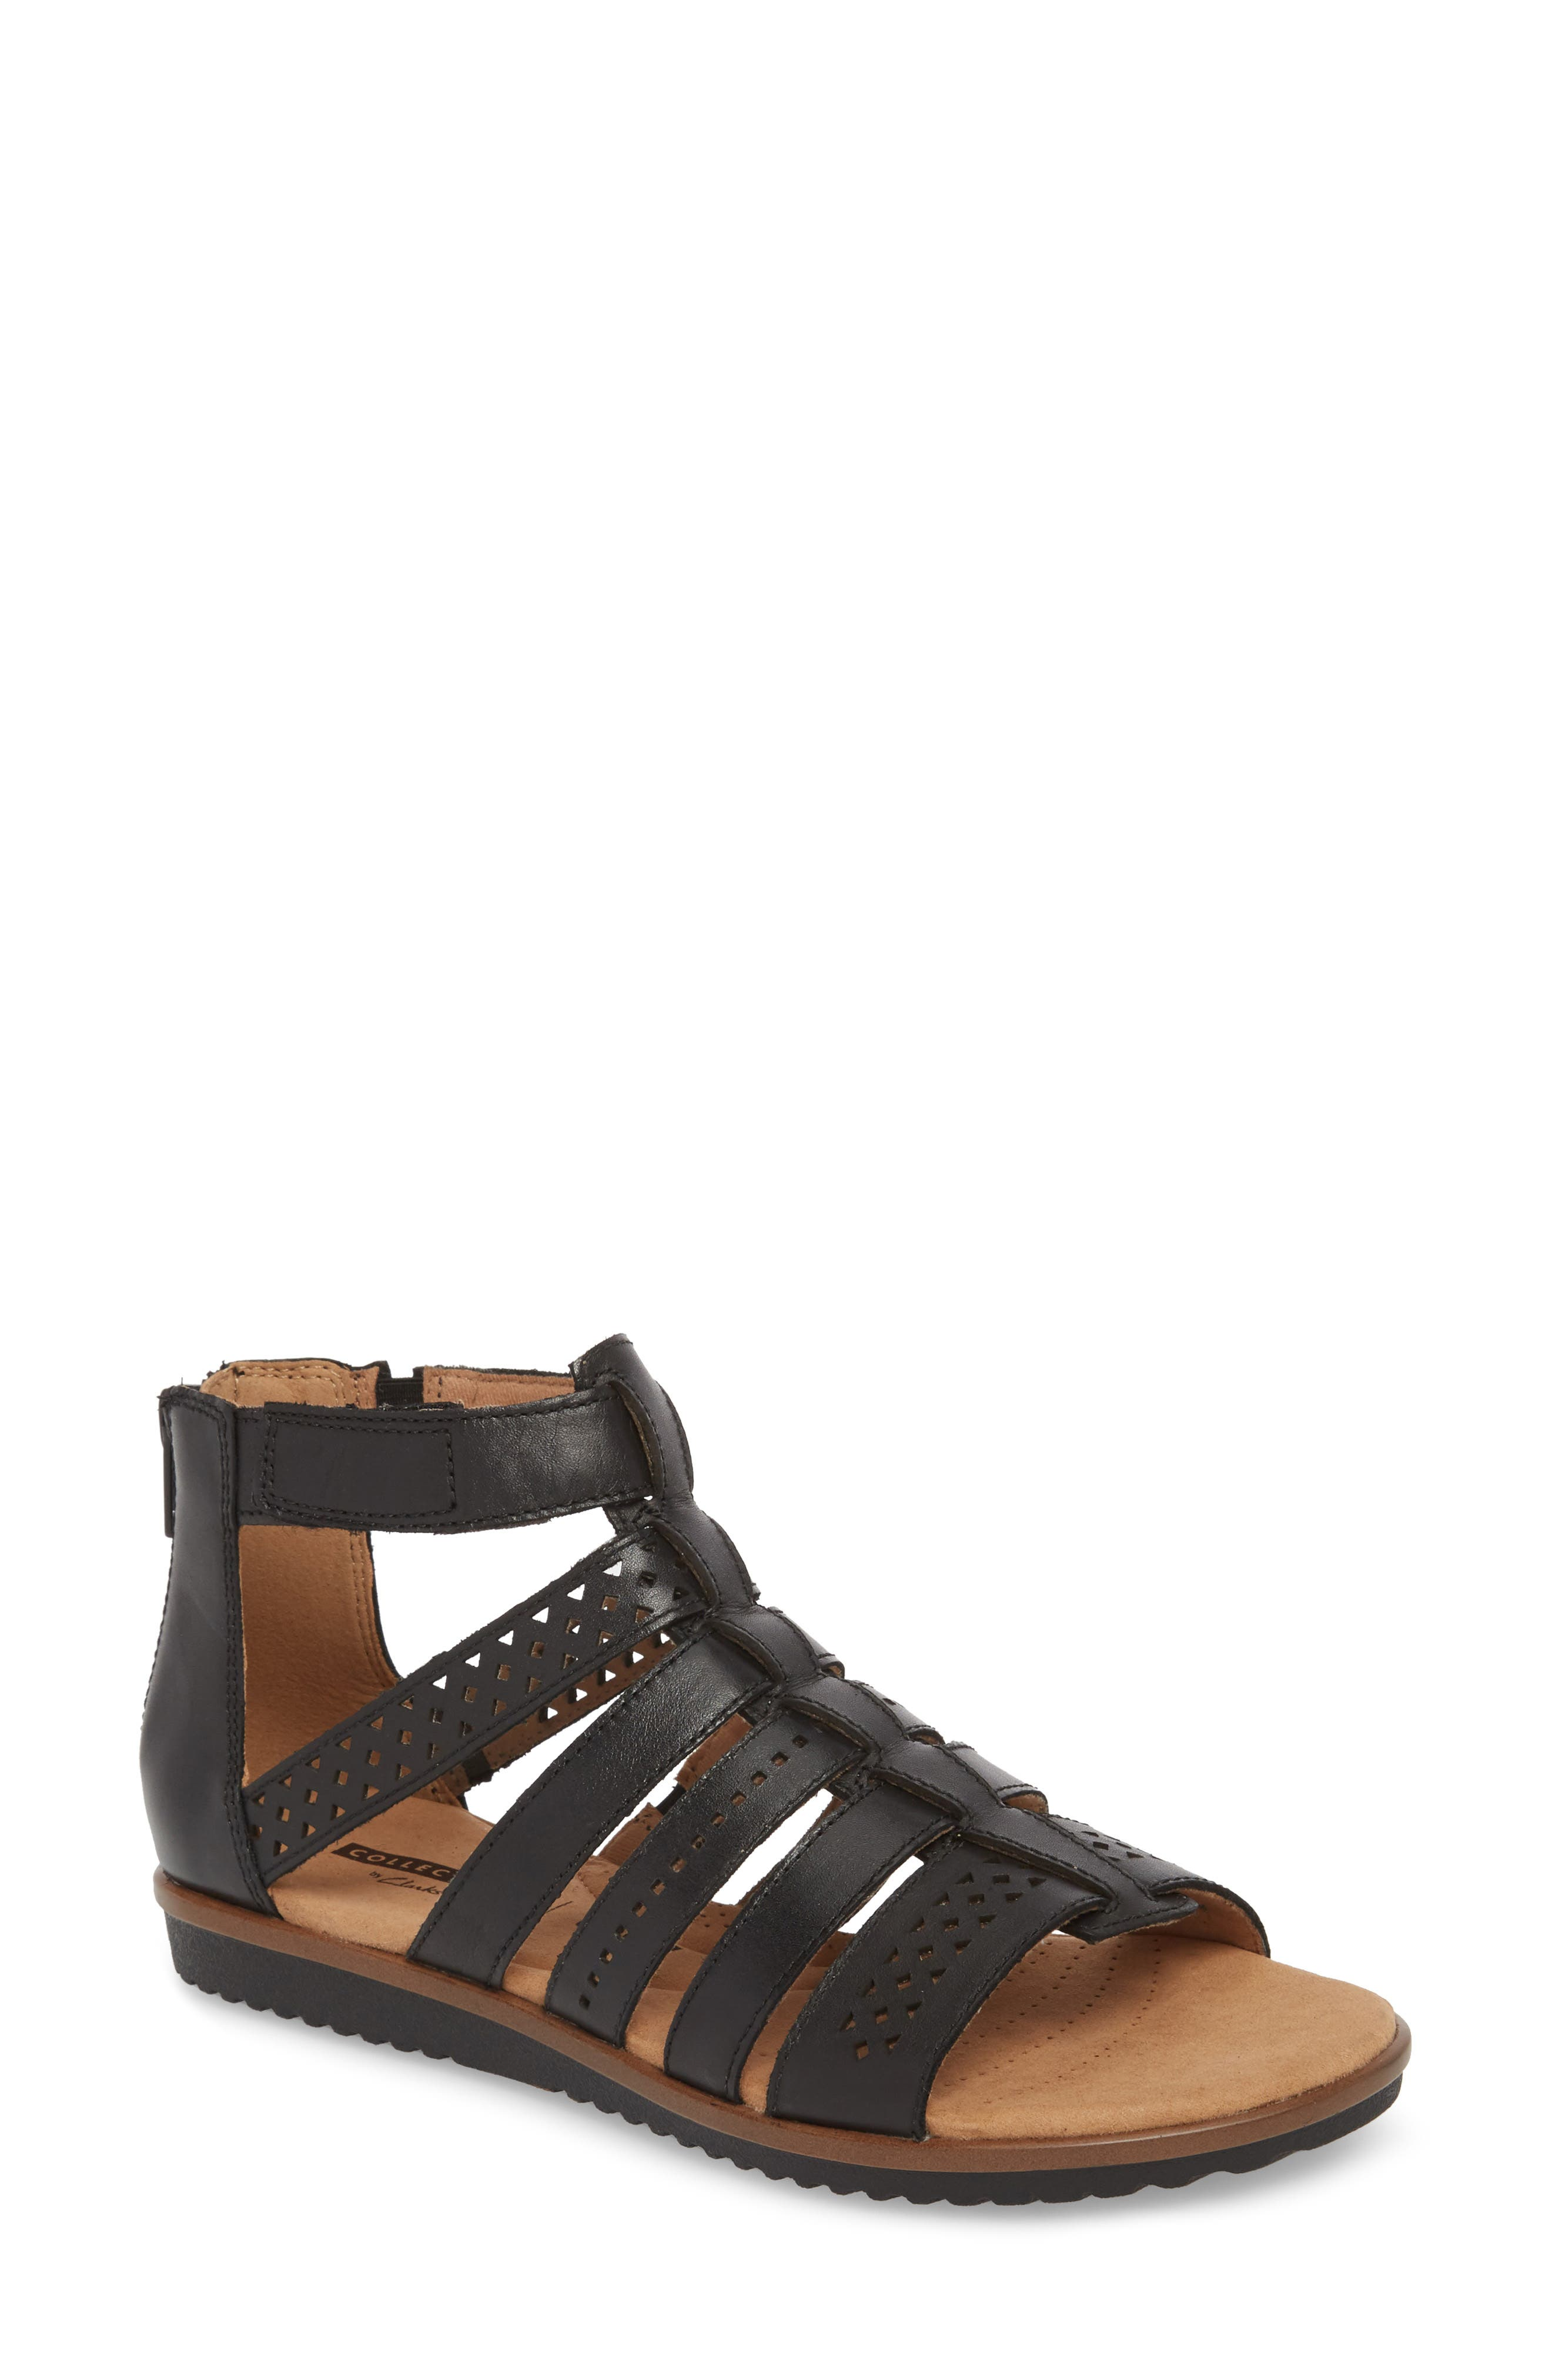 Alternate Image 1 Selected - Clarks® Kele Lotus Sandal (Women)